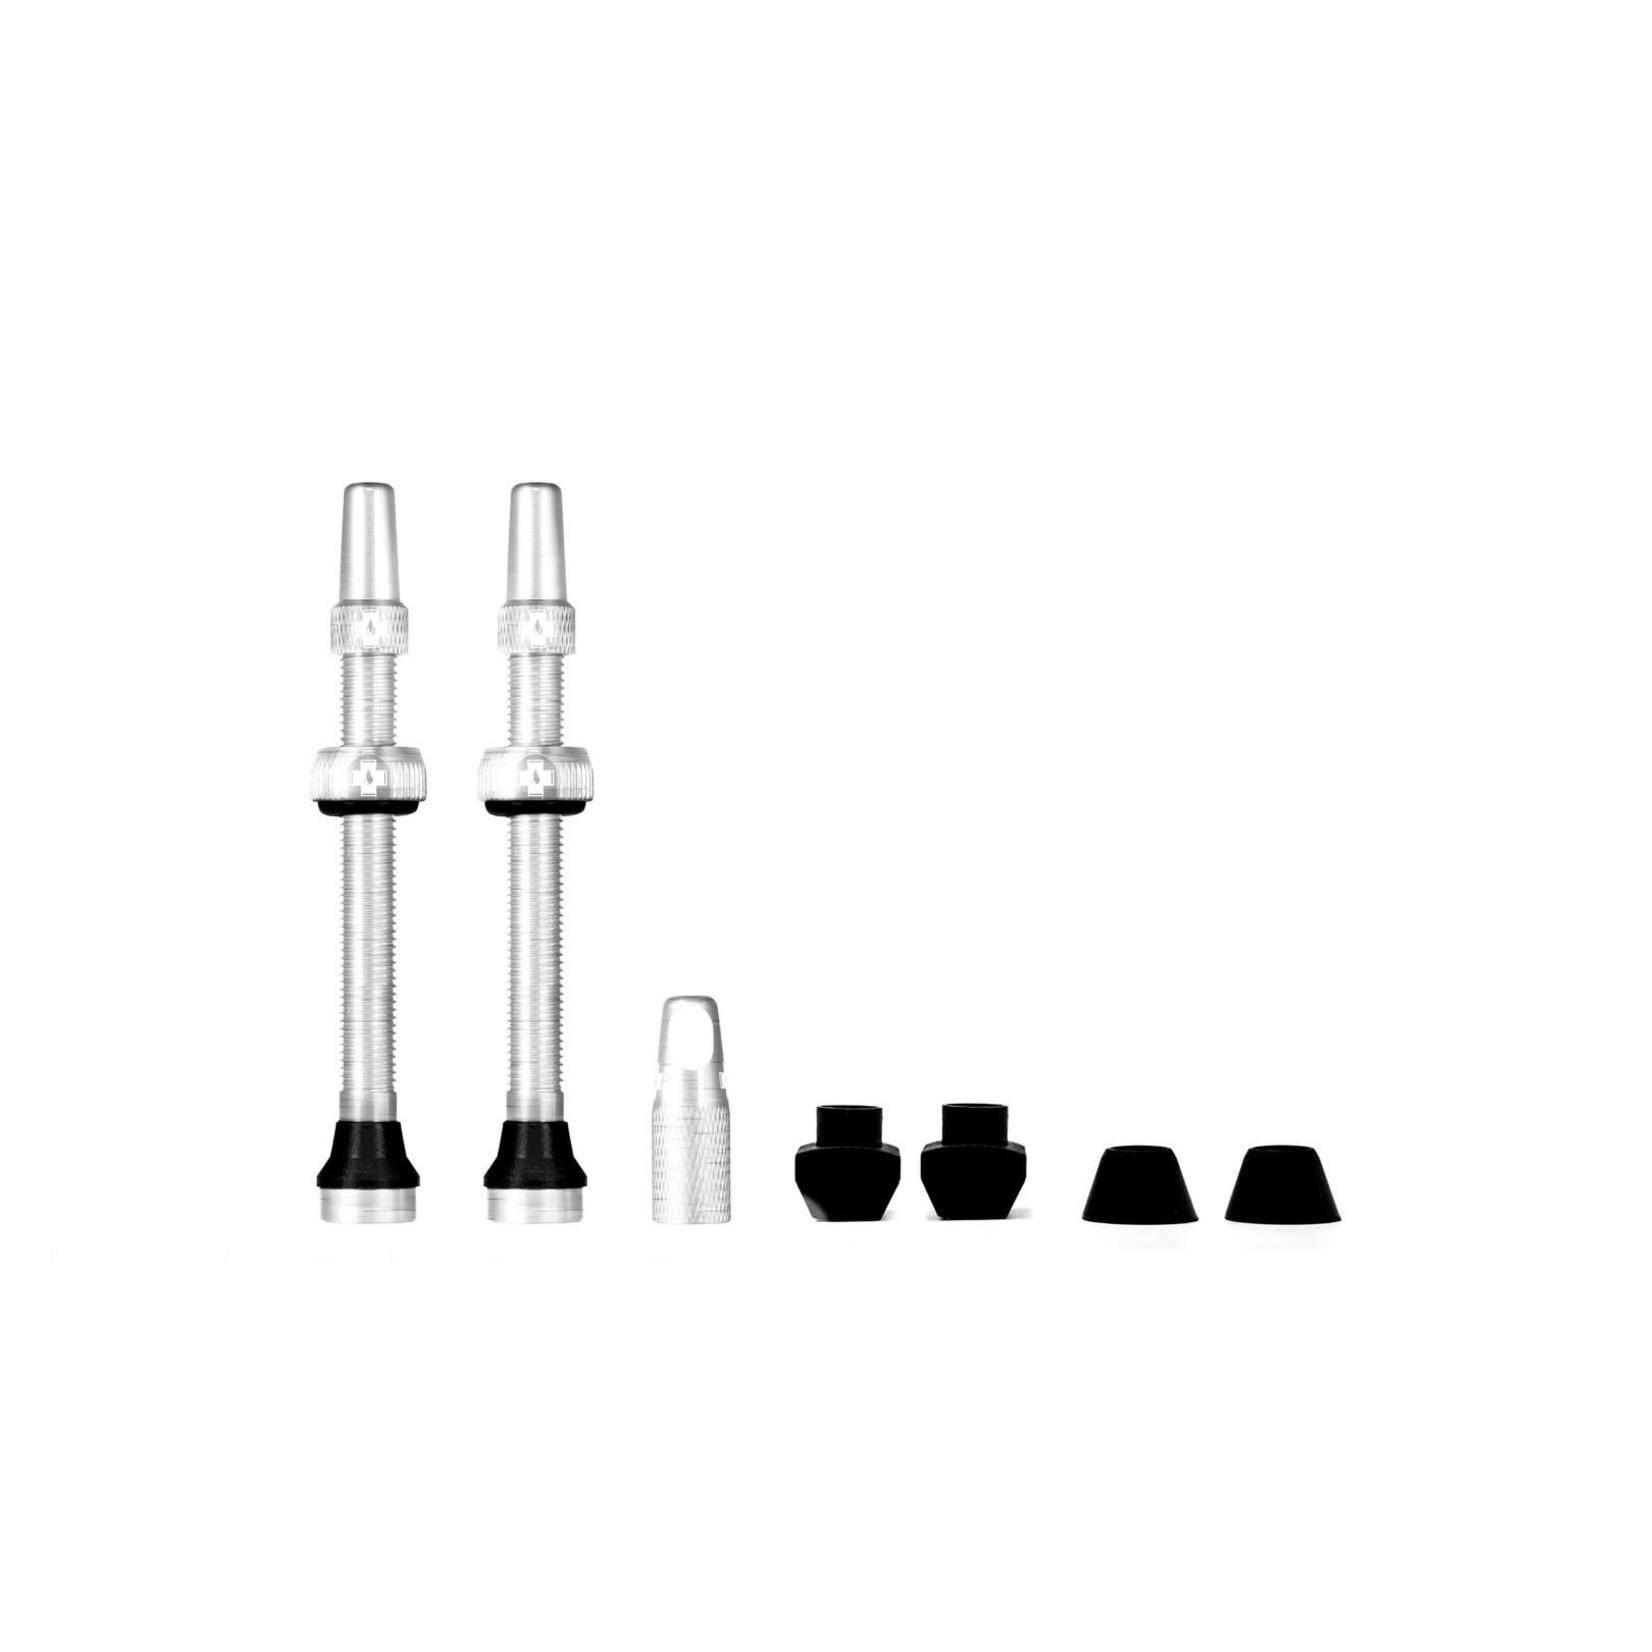 Muc-Off Muc-Off kit valvola tubeless 60mm - argento